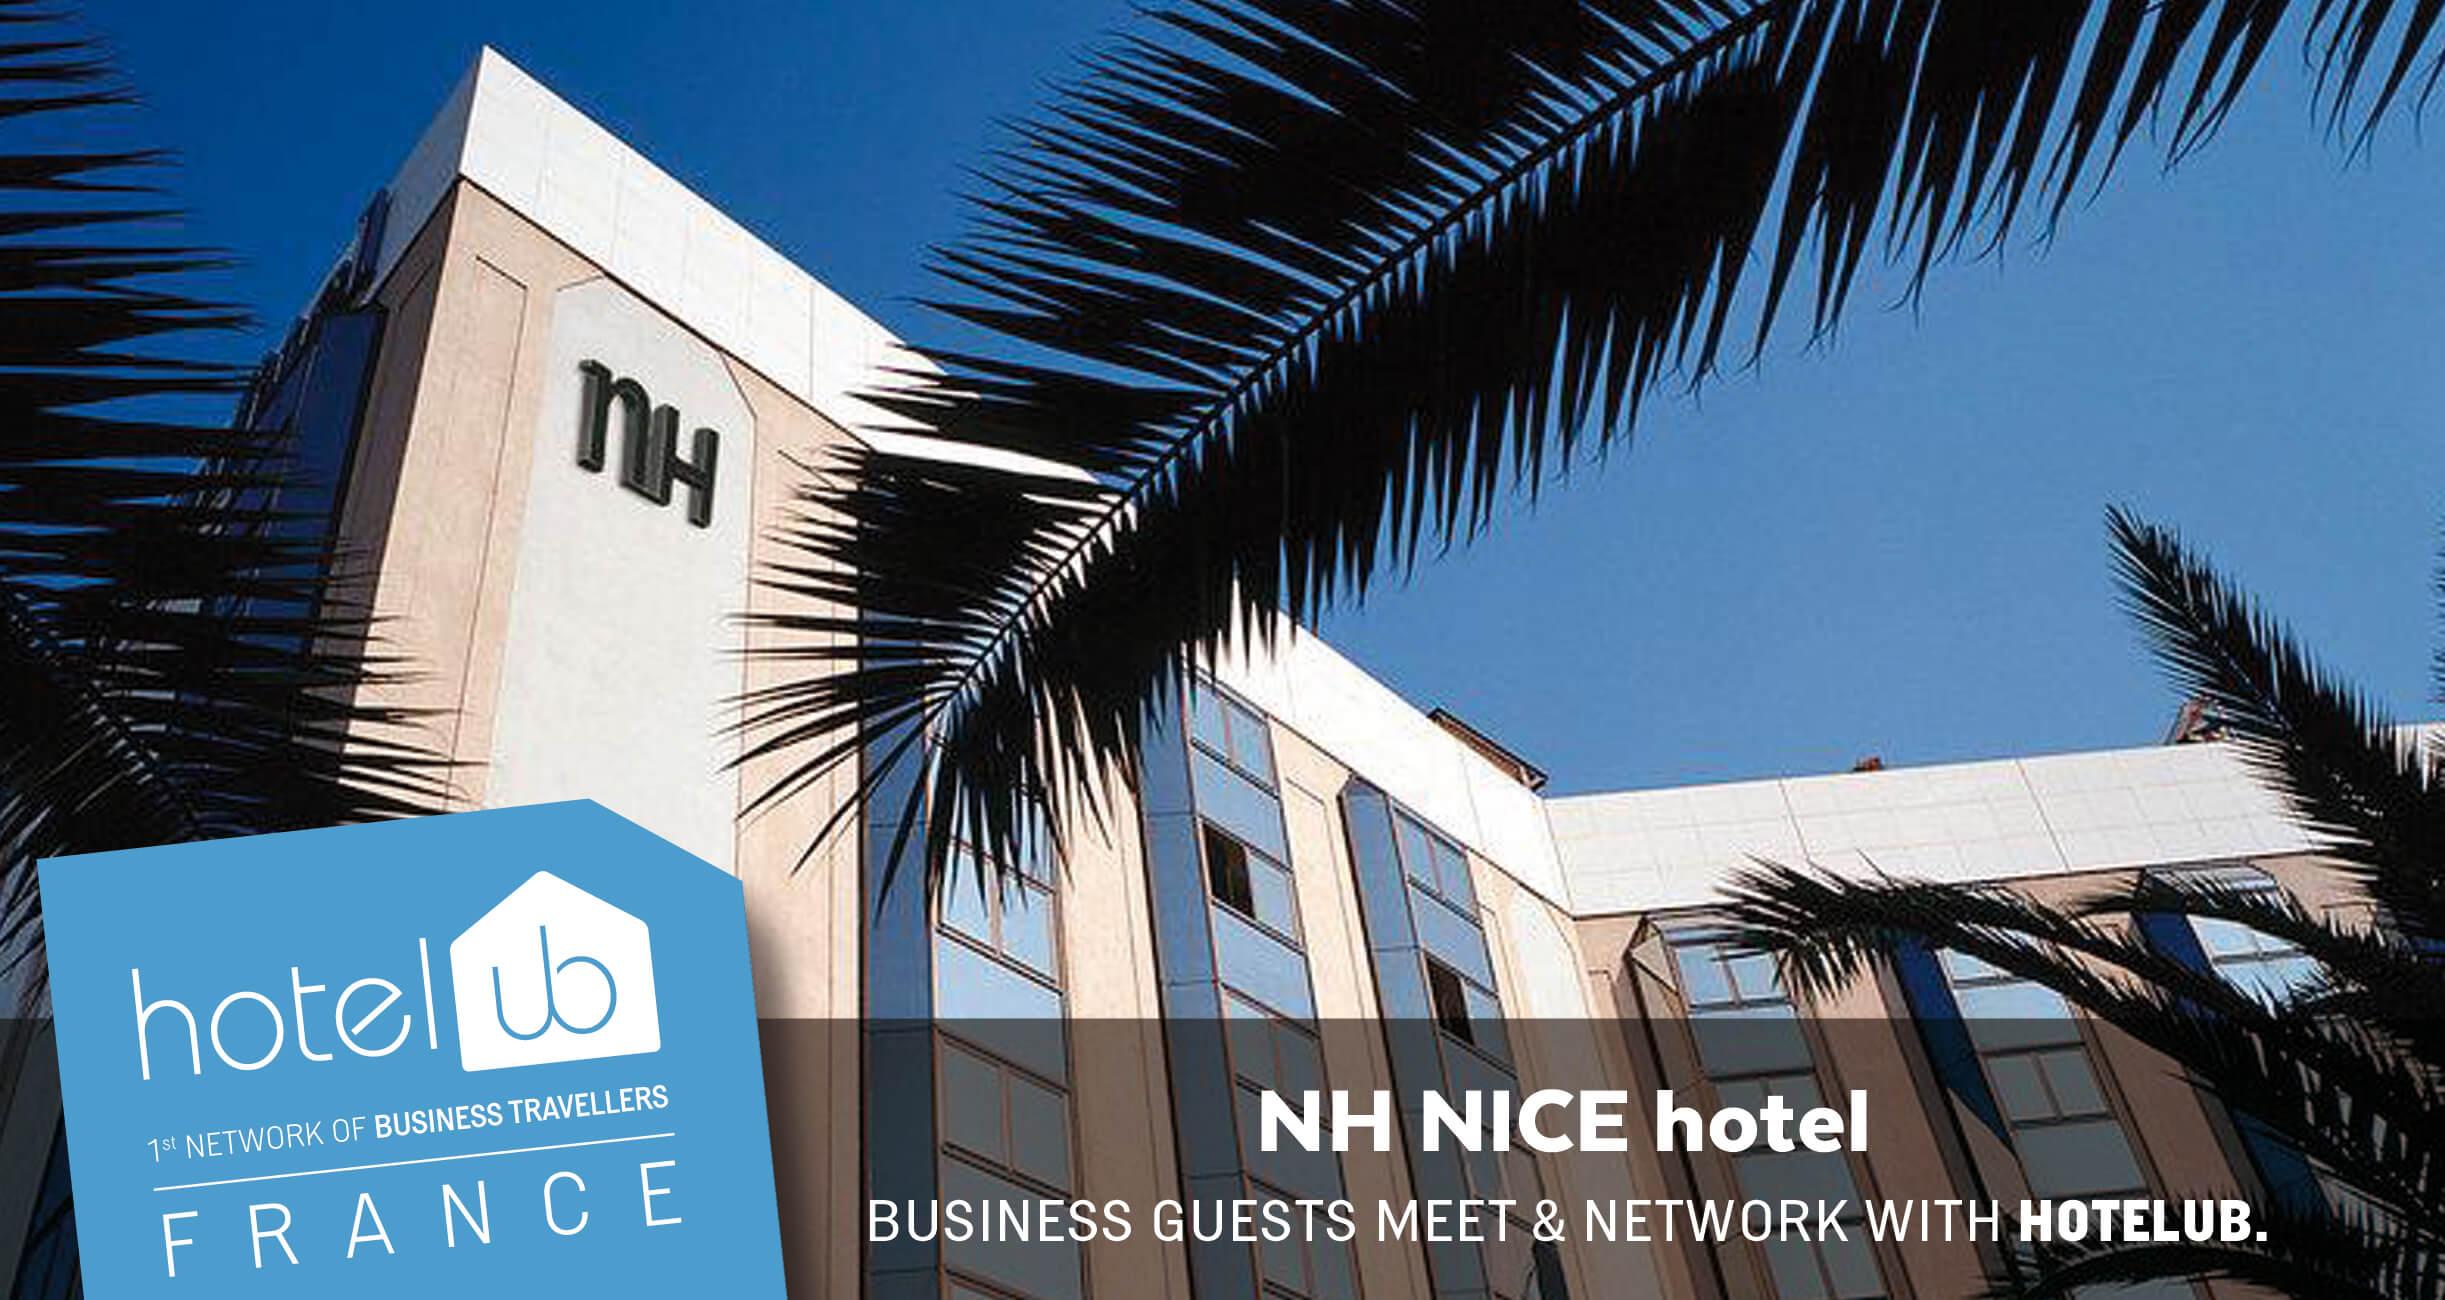 NH hotelub